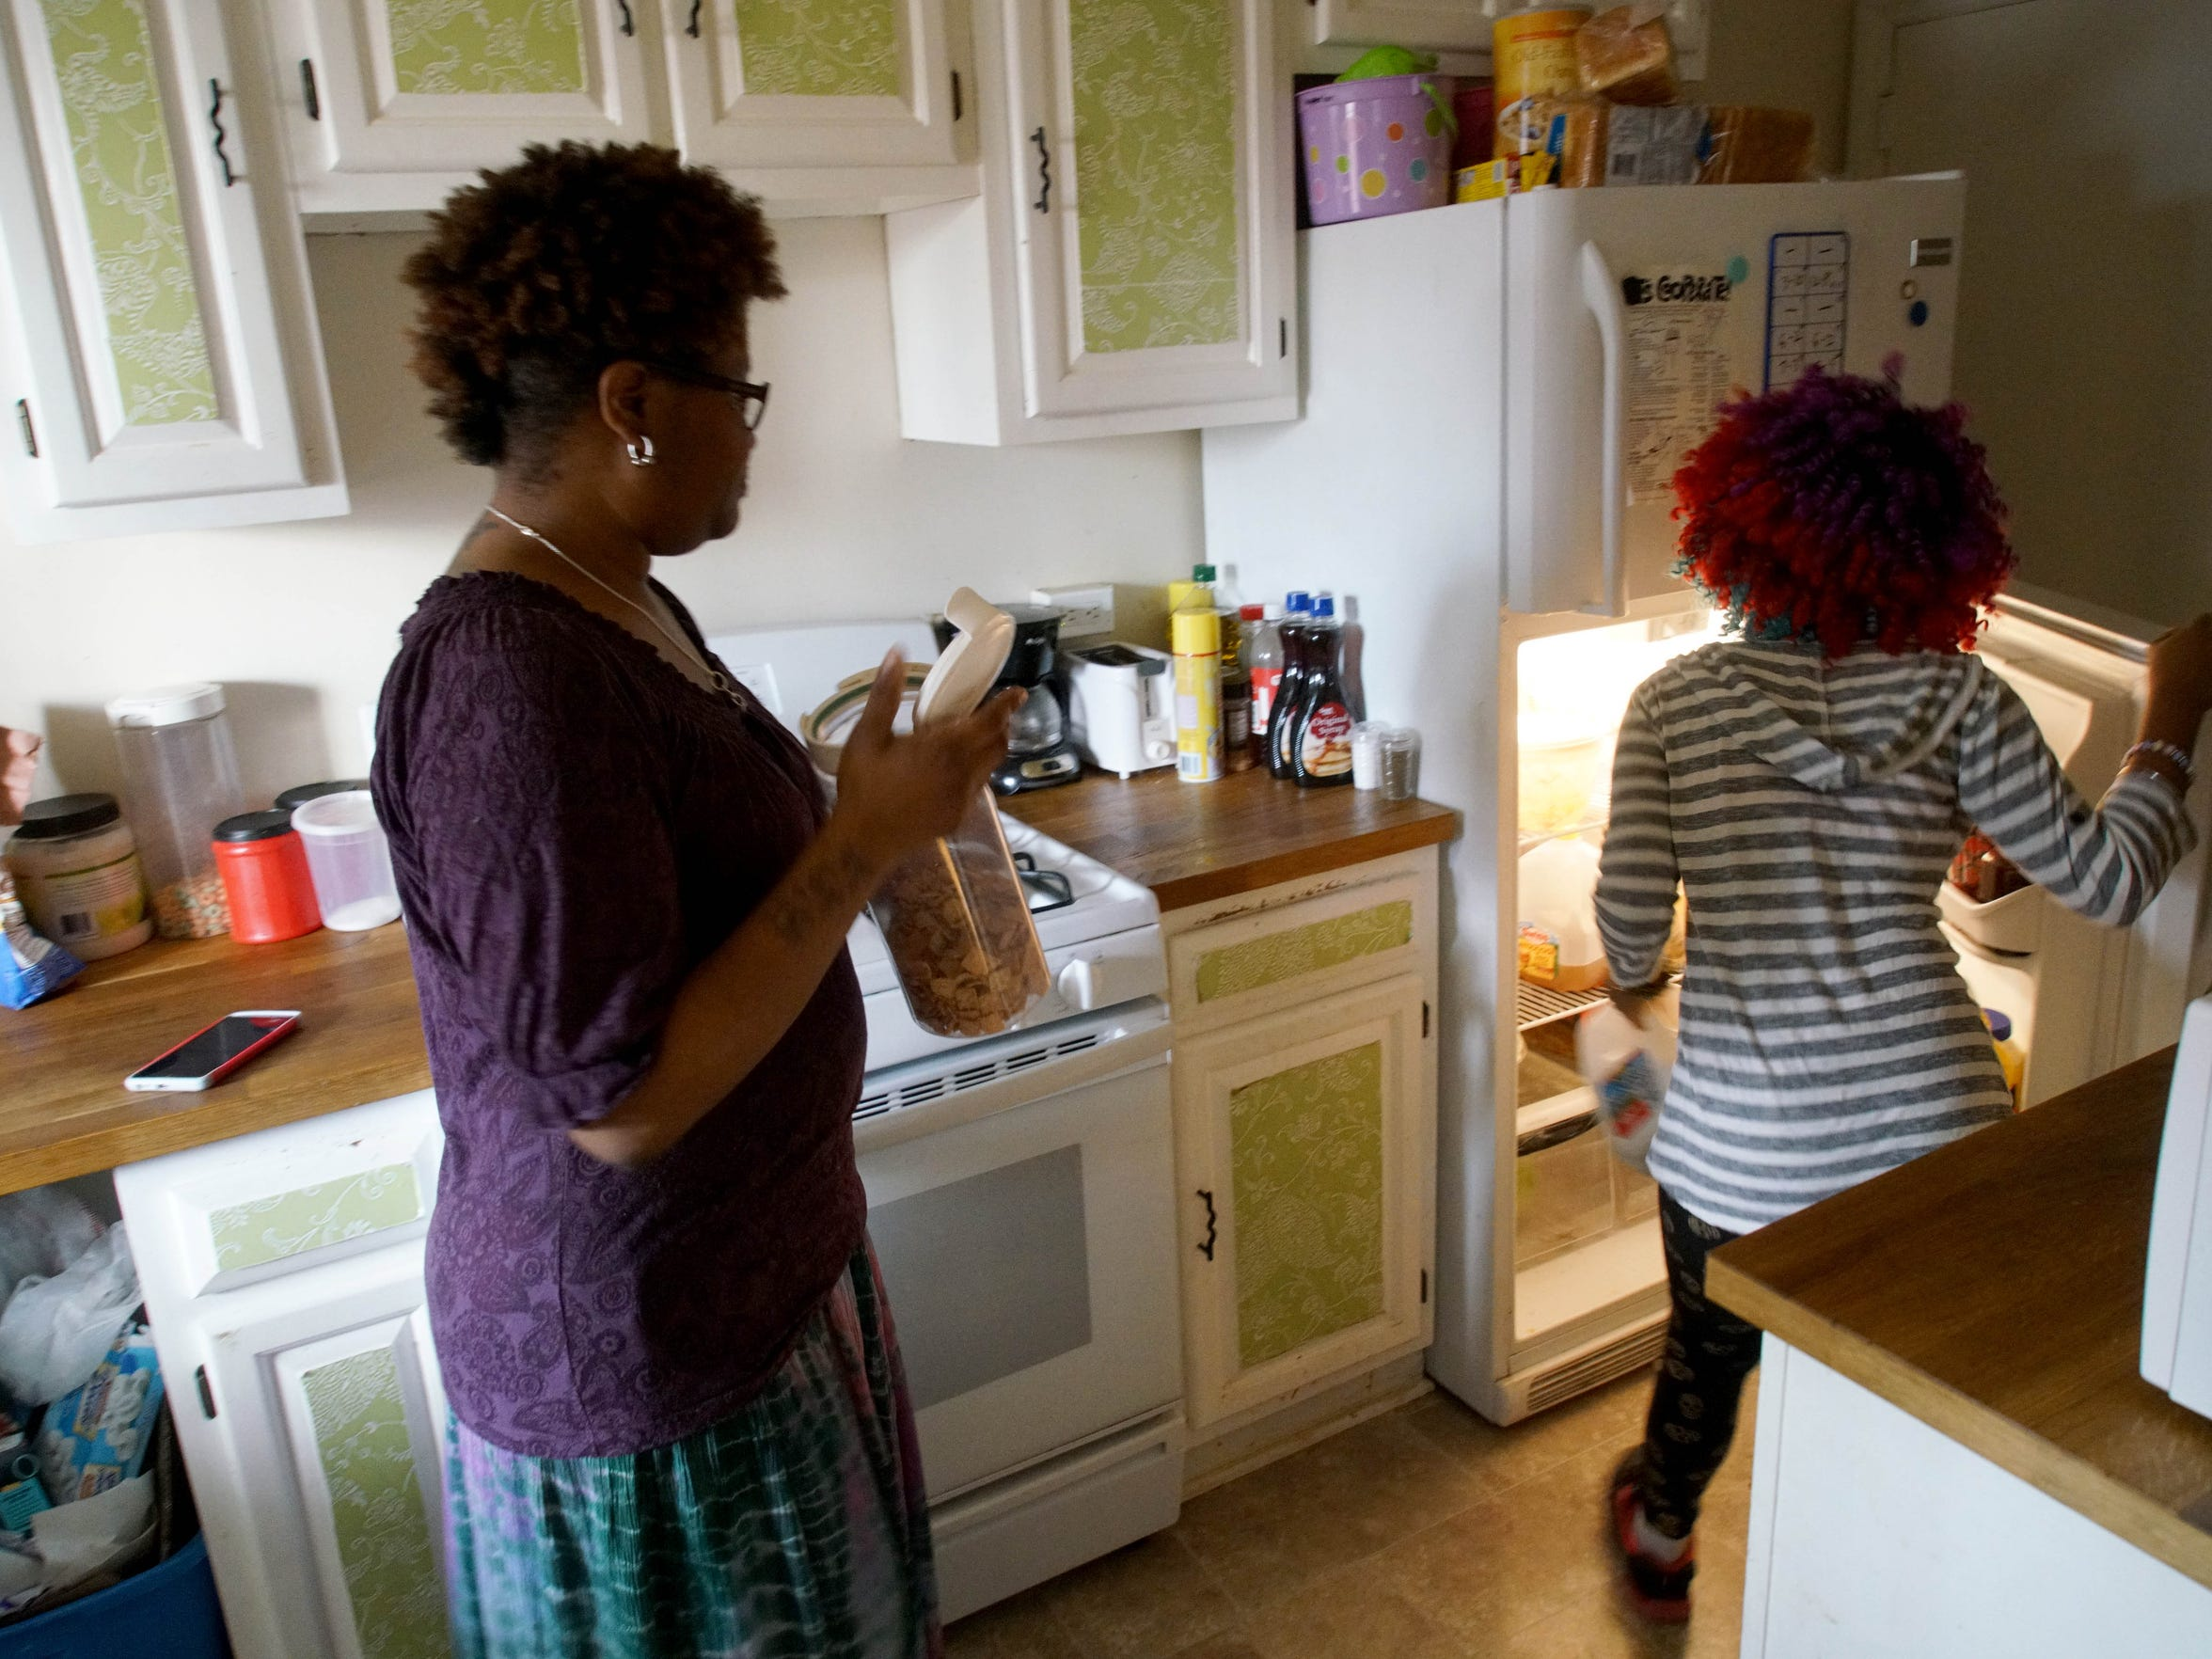 DeShanna helps fix a snack for her 13-year-old transgender daughter.